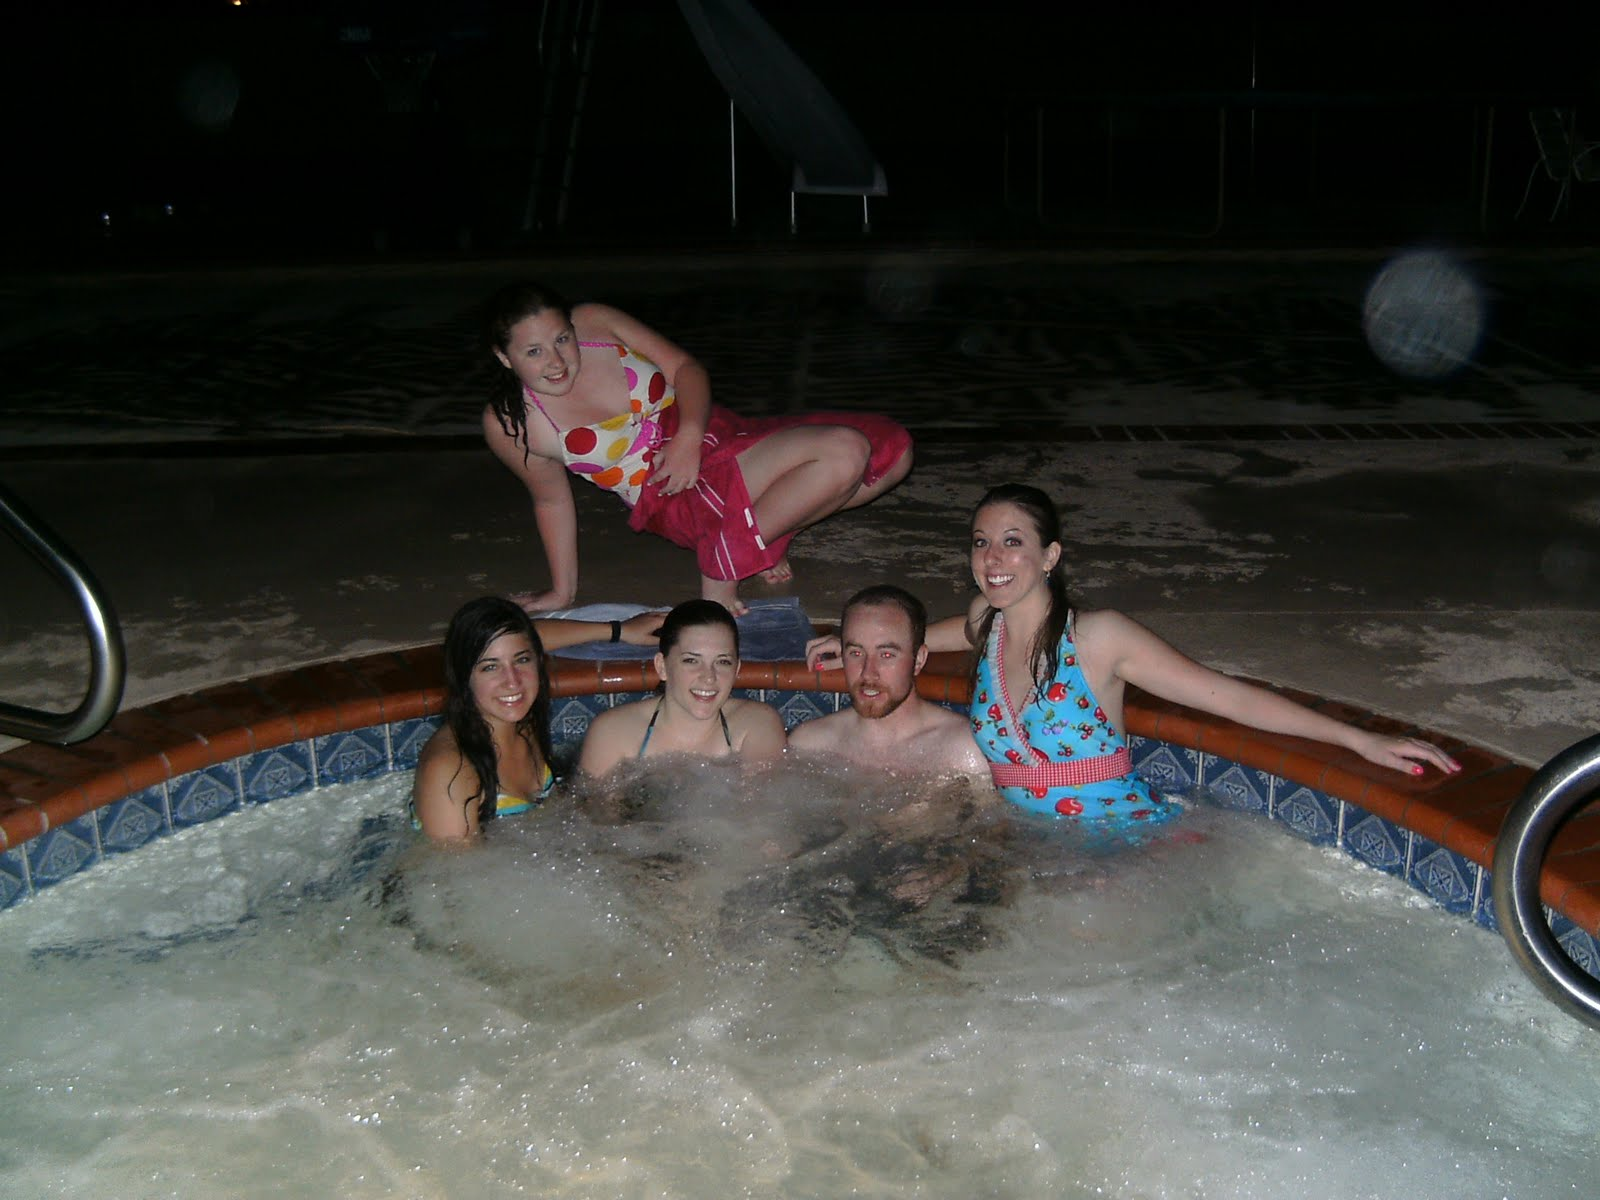 Spring break hot tub